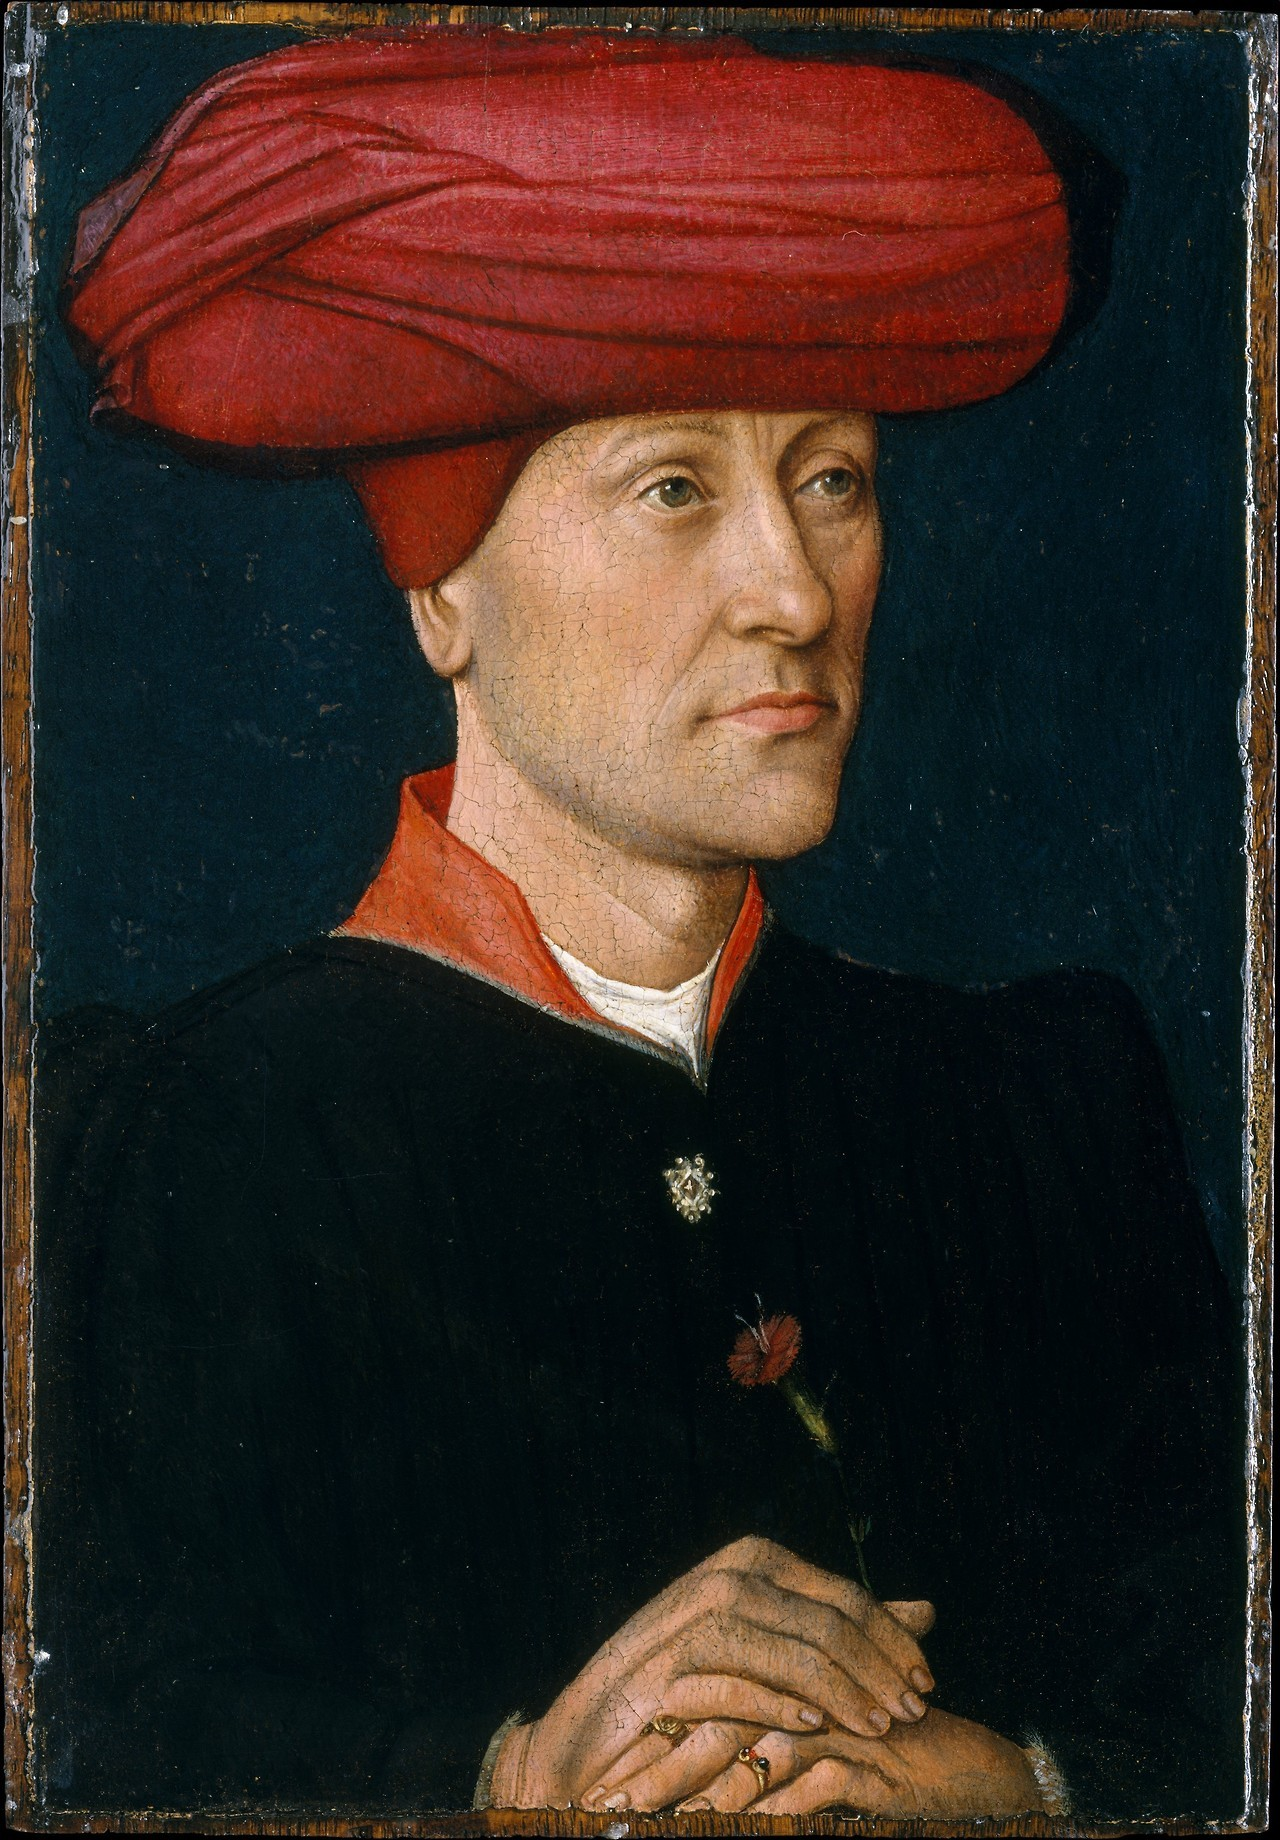 Netherlandish1